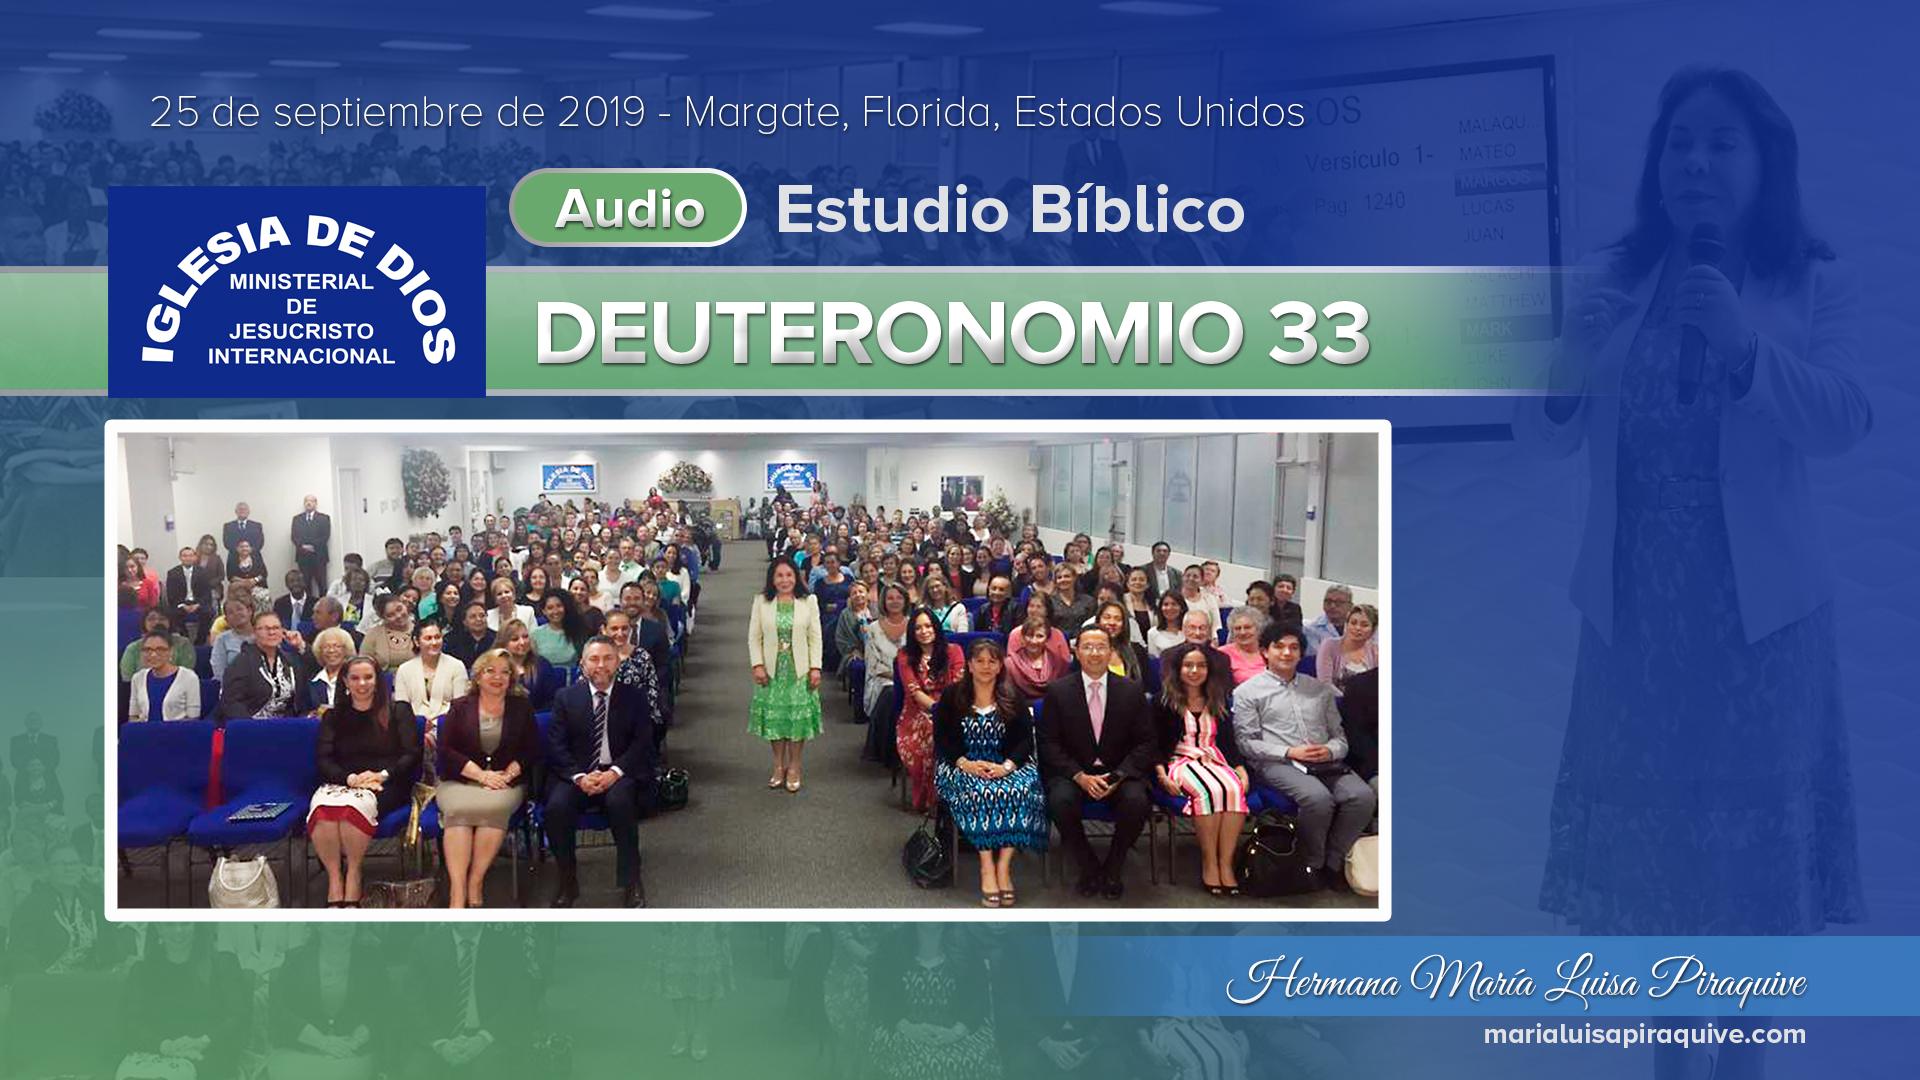 Audio: Estudio Bíblico Deuteronomio 33 – Hna. María Luisa Piraquive